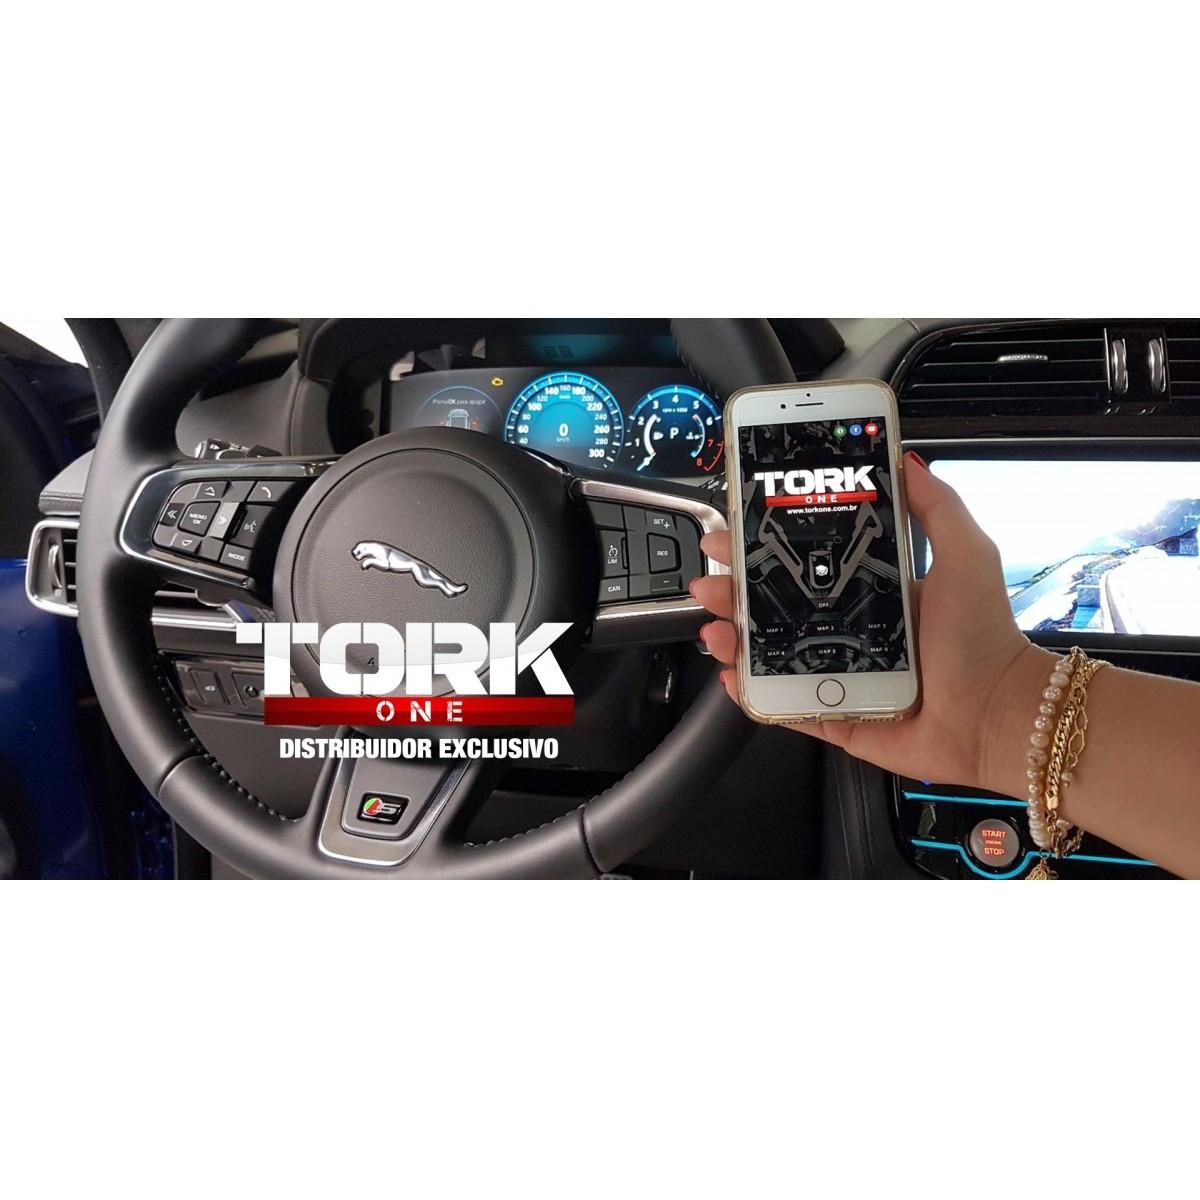 Gás Pedal - Suzuki - Tork One c/s Bluetooth